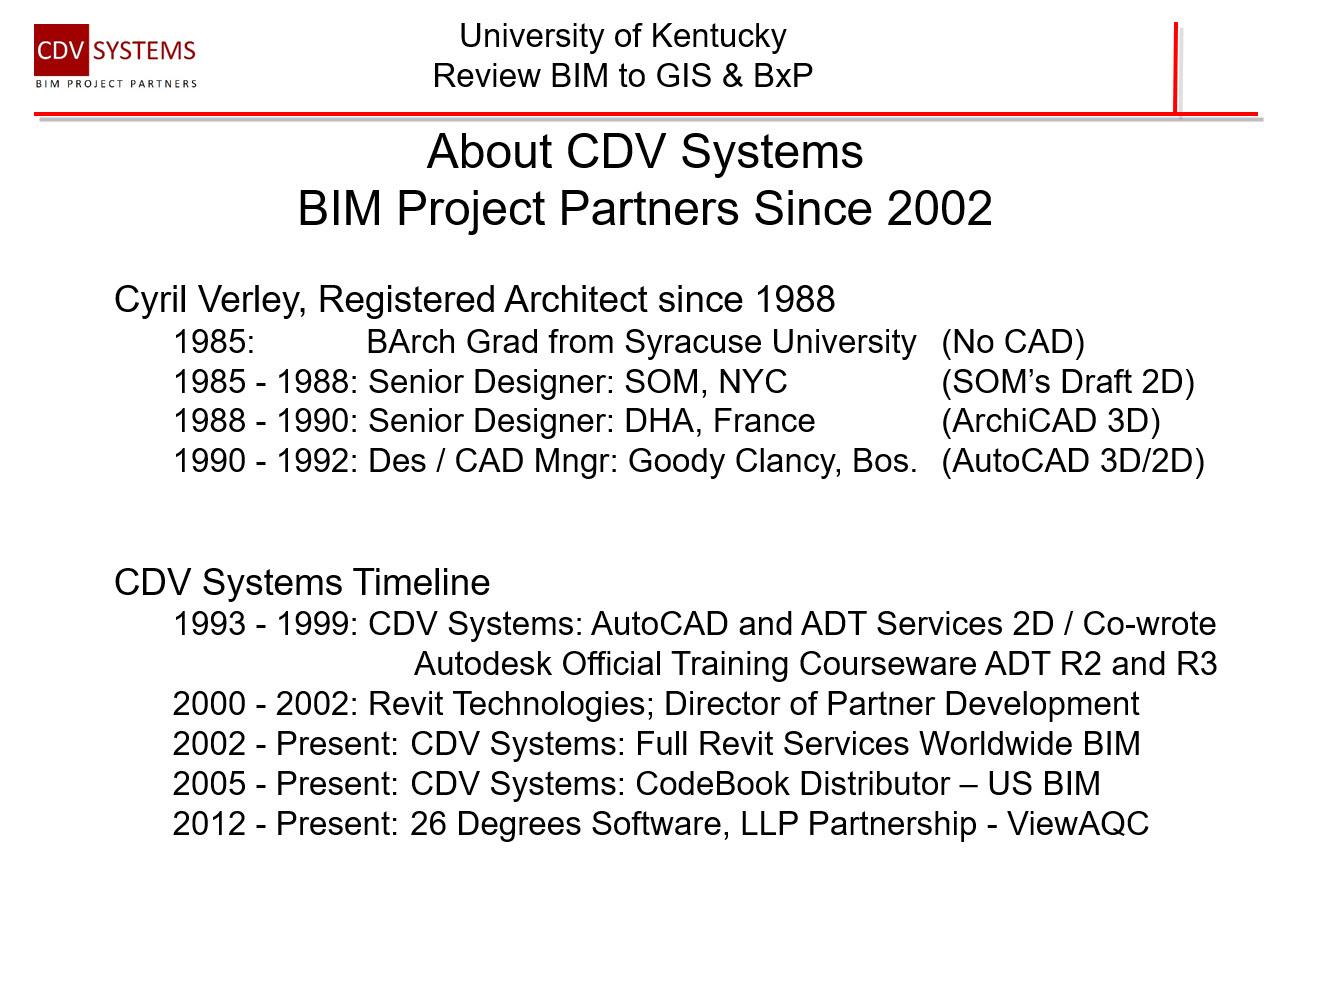 University of Kentucky_001c.jpg